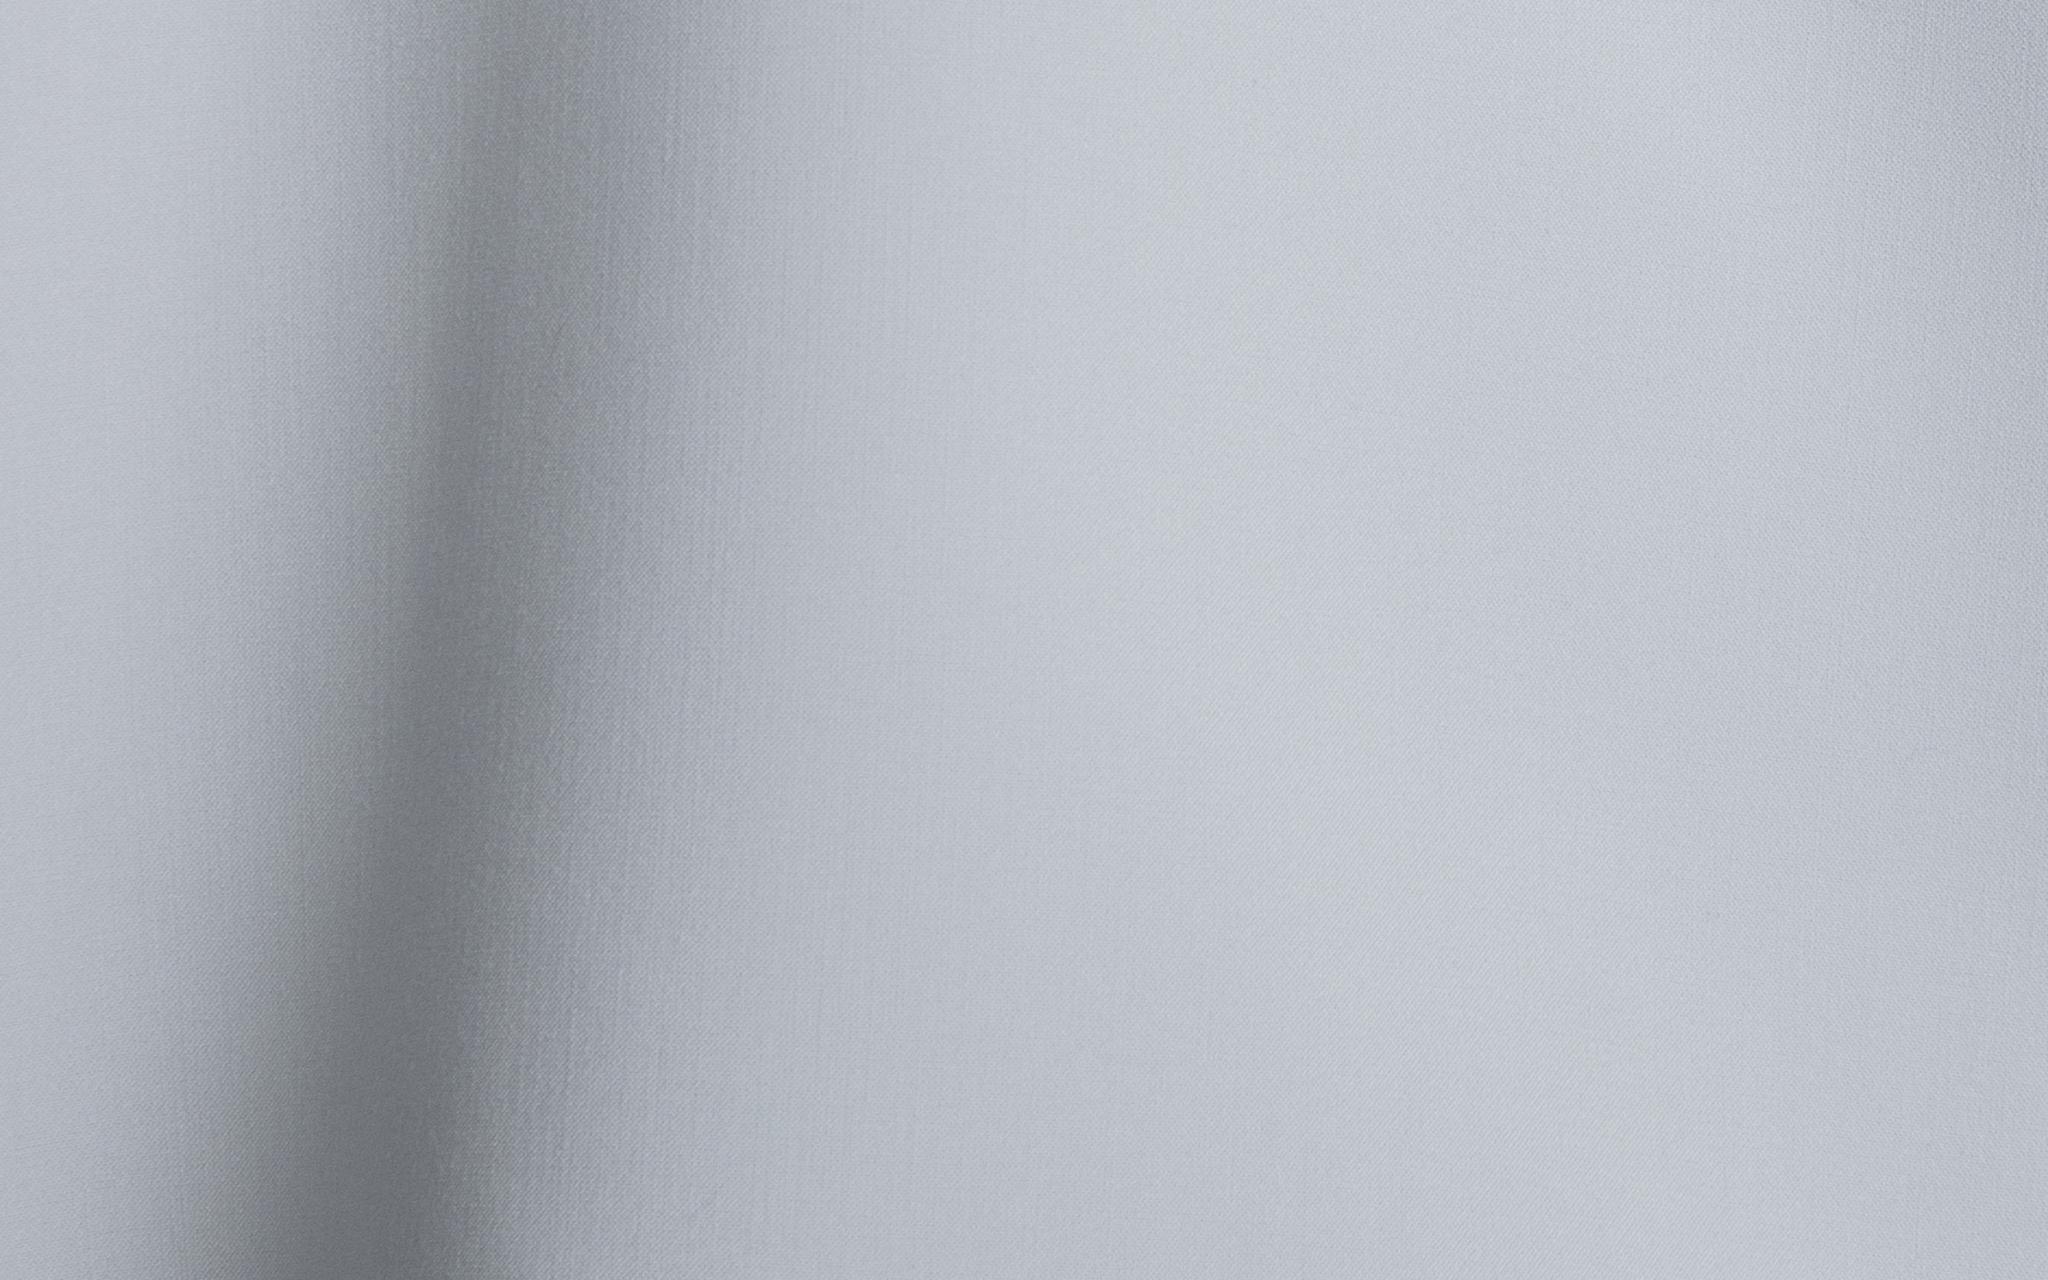 Тренч серо-голубой XS-S (последние единички)